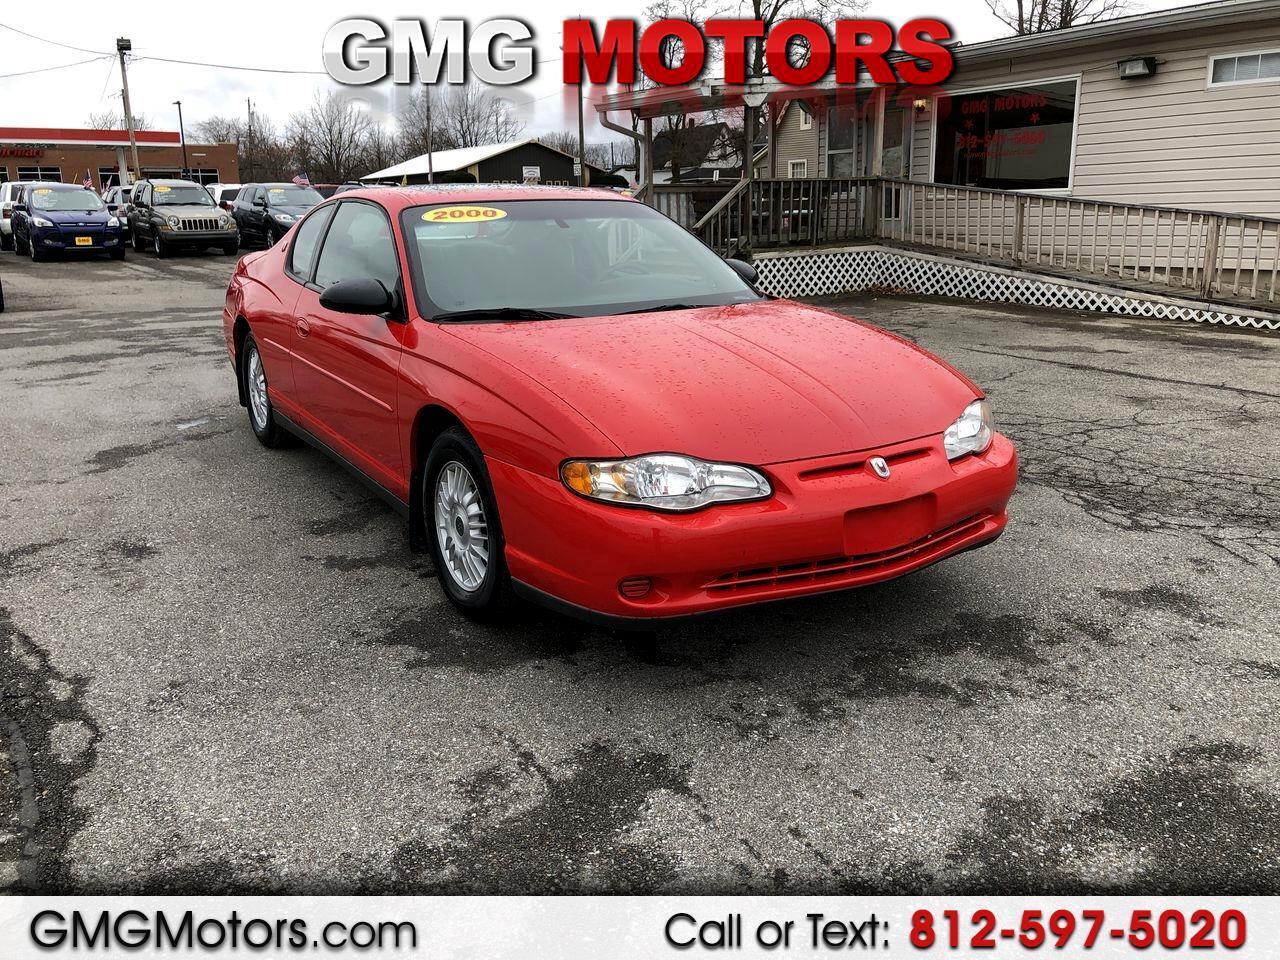 2000 Chevrolet Monte Carlo 2dr Cpe LS